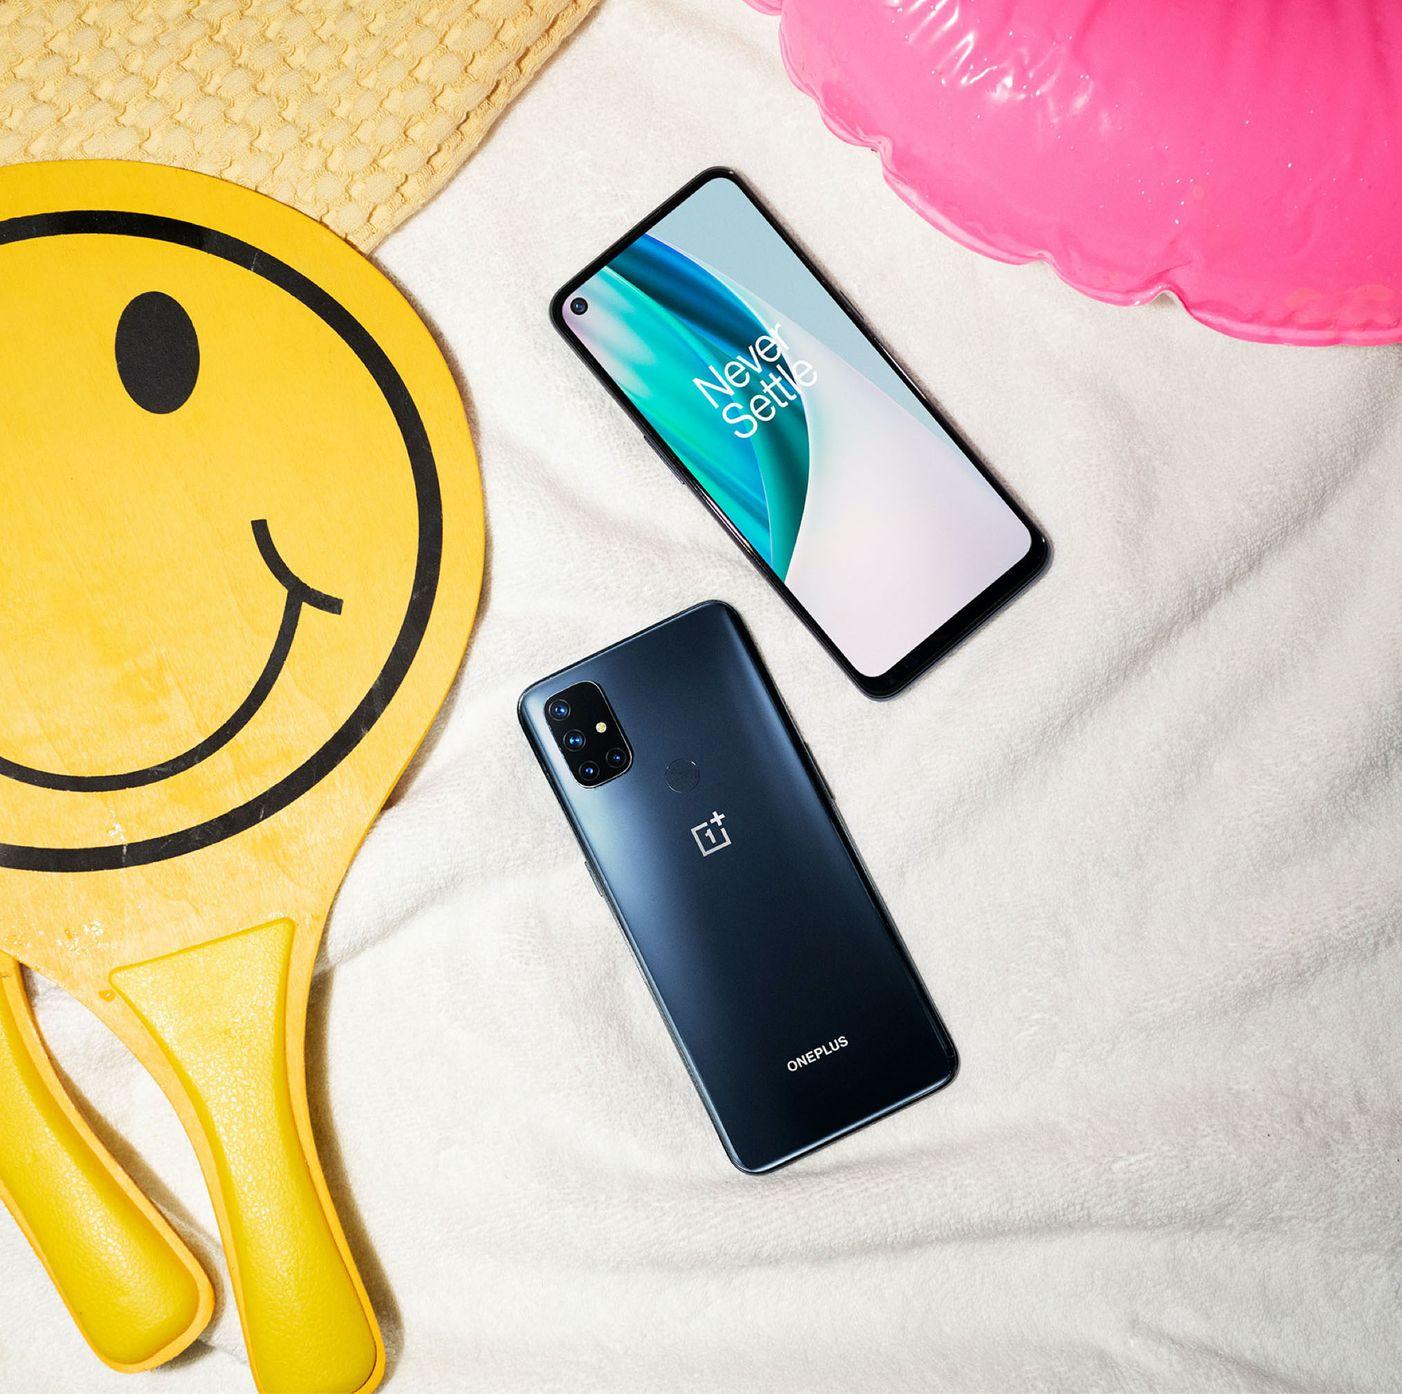 Nuovi OnePlus Nord N10 5G e N100 a partire da 199 euro